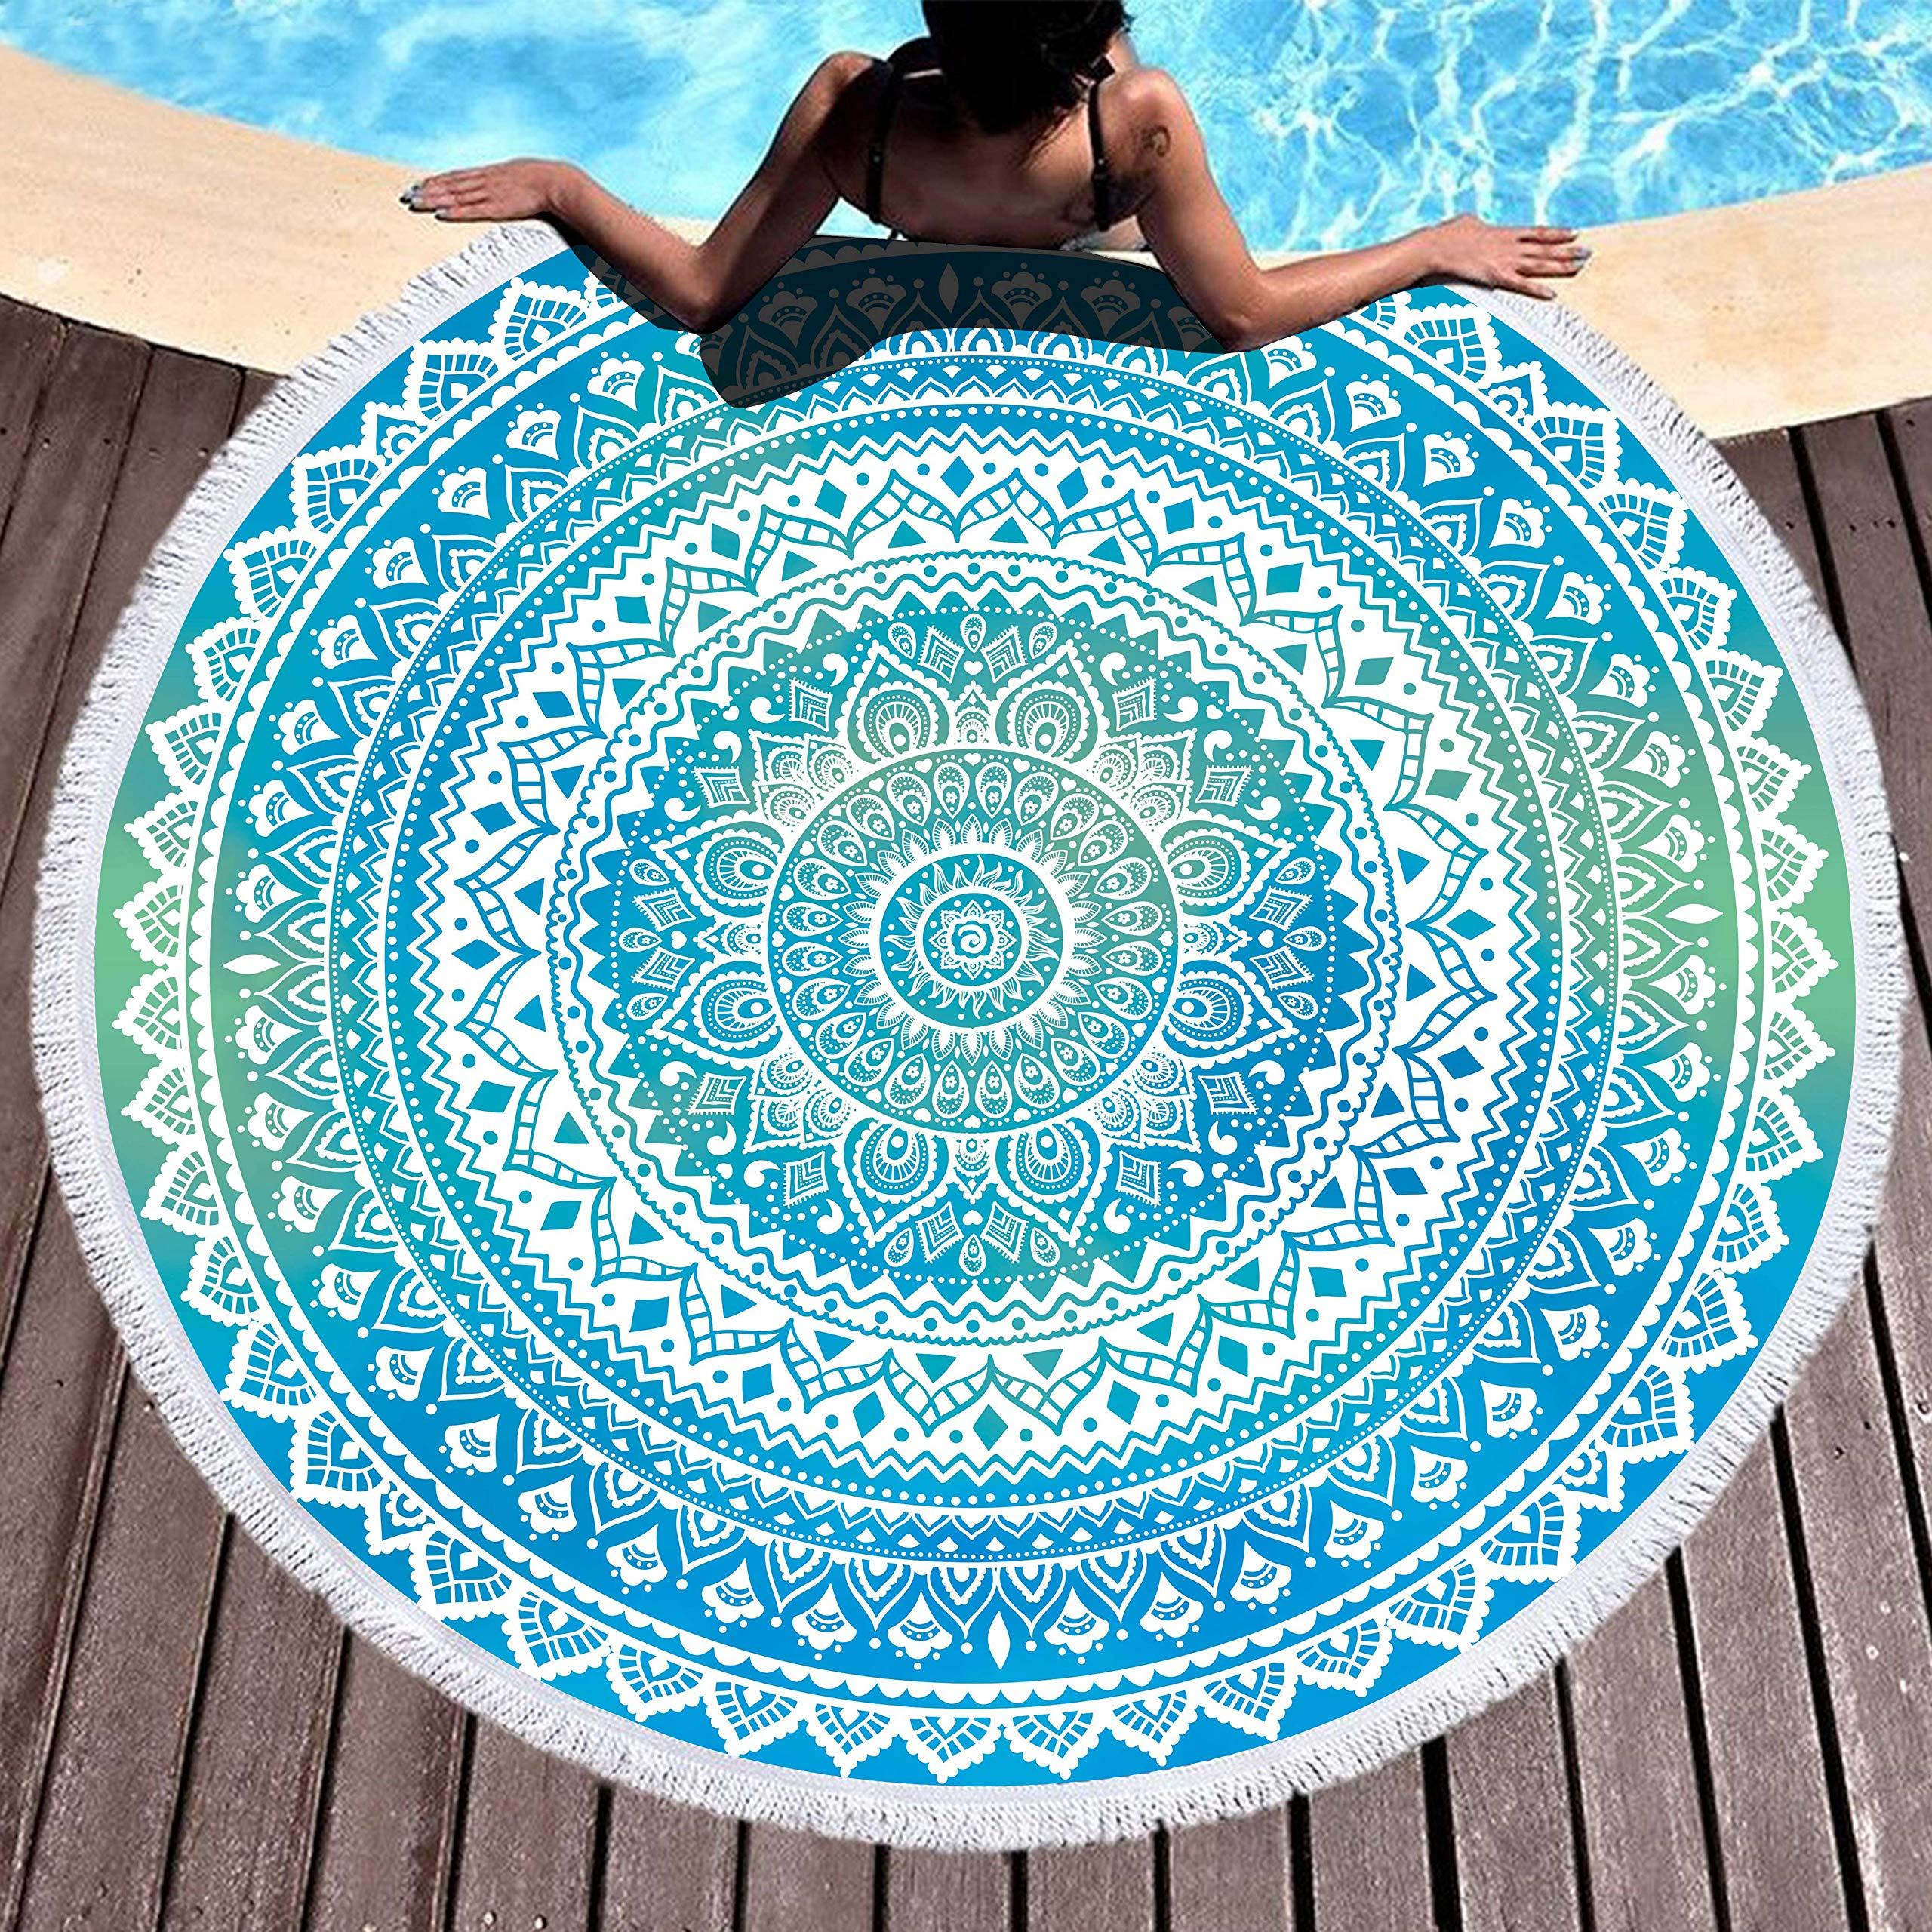 Bonsai Tree Mandala Round Beach Towel, Indian Hippie Boho Extra Large Sand Proof Beach Blanket, Circle Meditation Yoga Mat with Tassels 59''